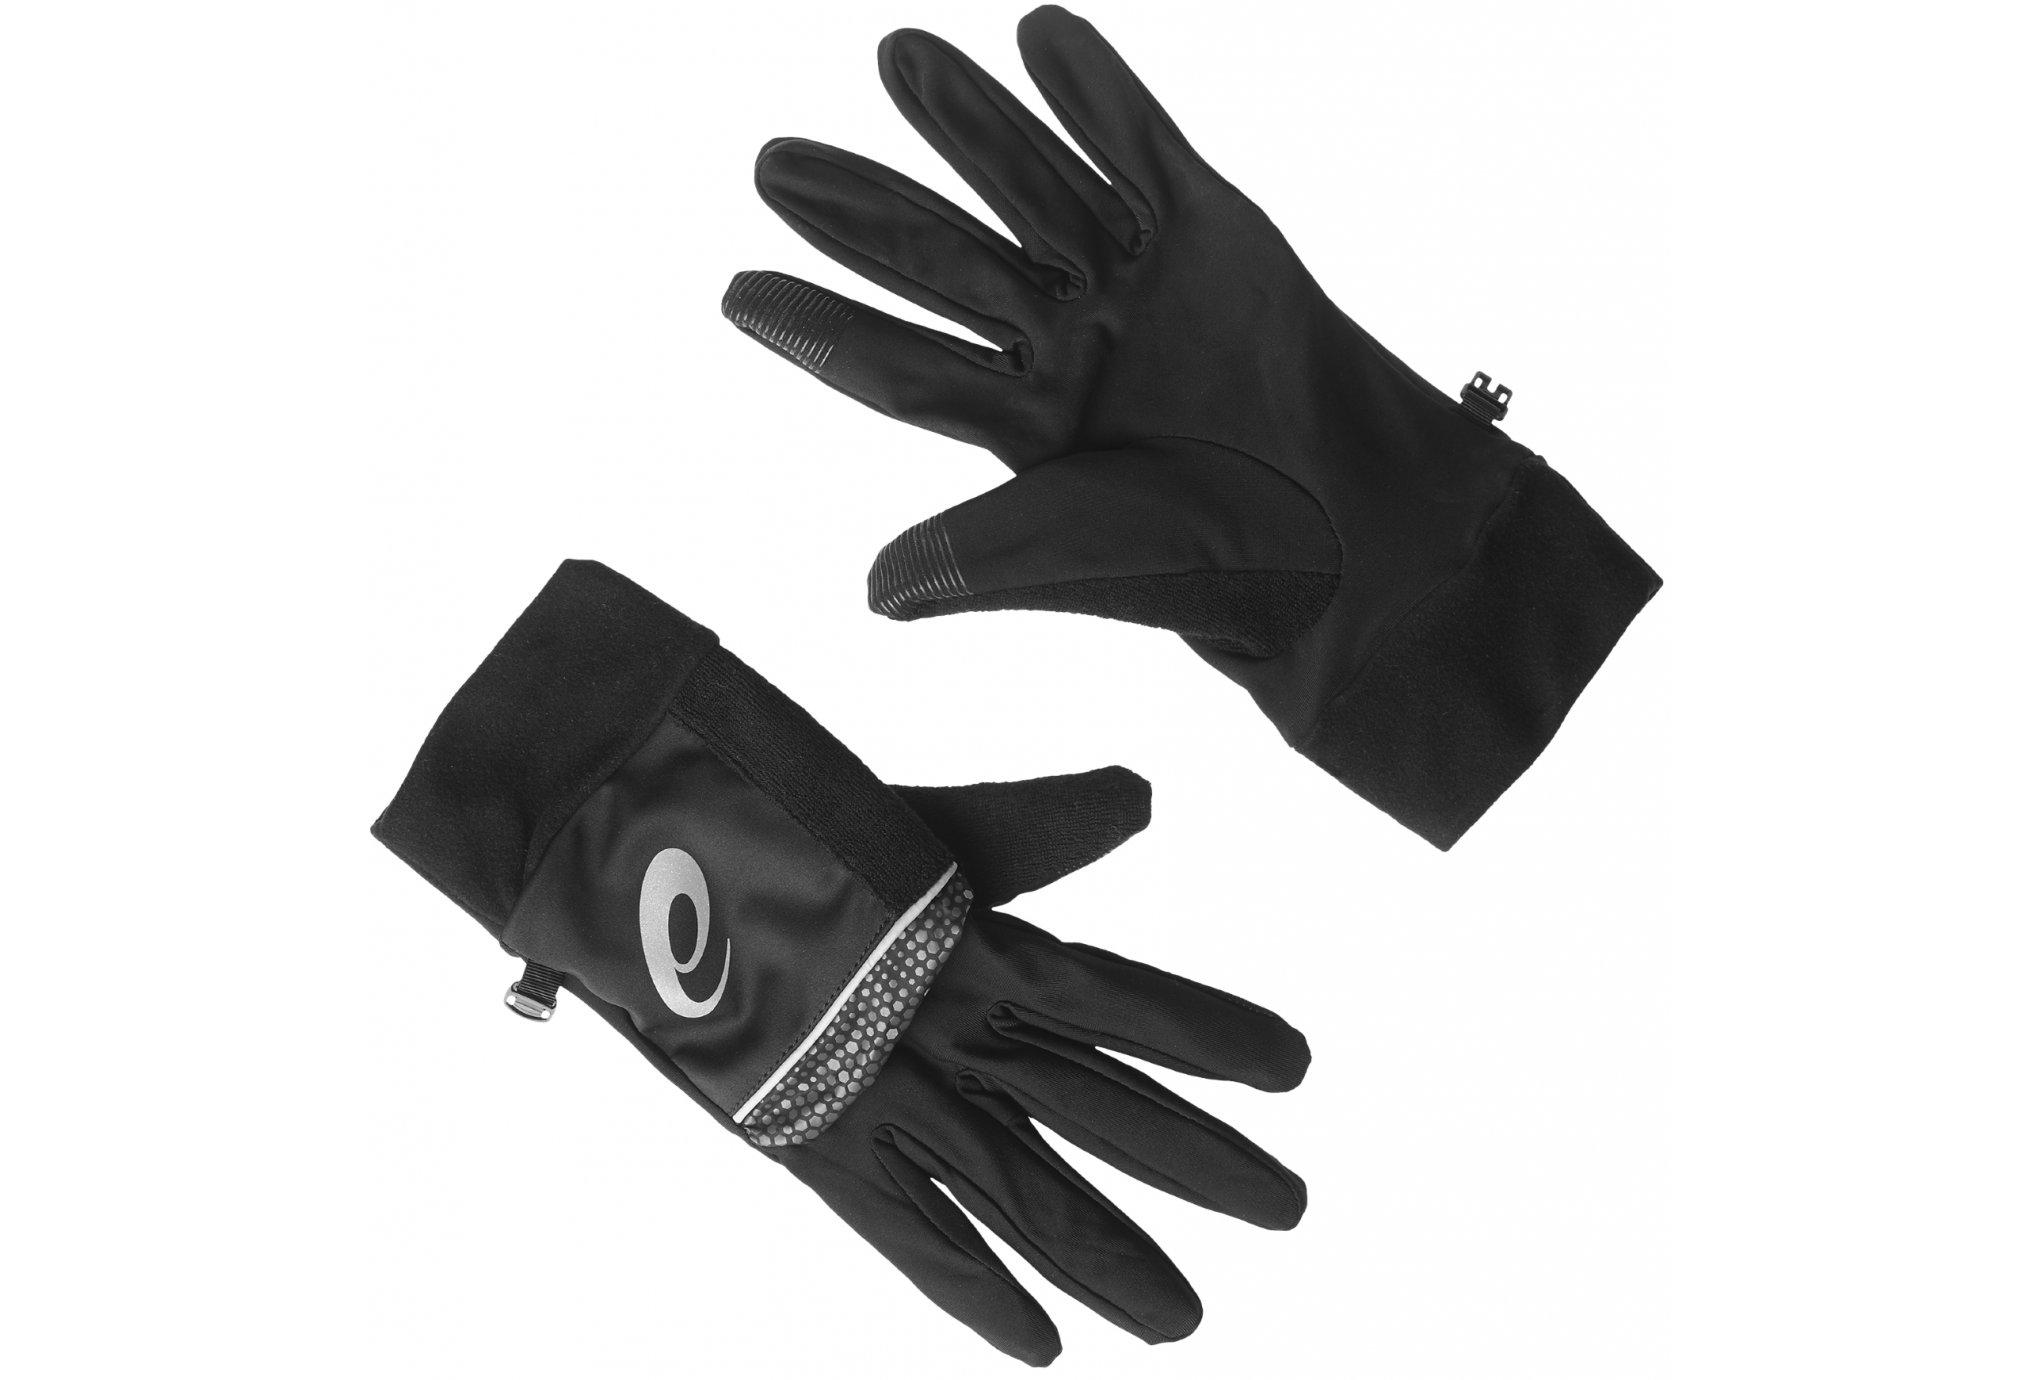 Asics Pfm mitten bonnets / gants